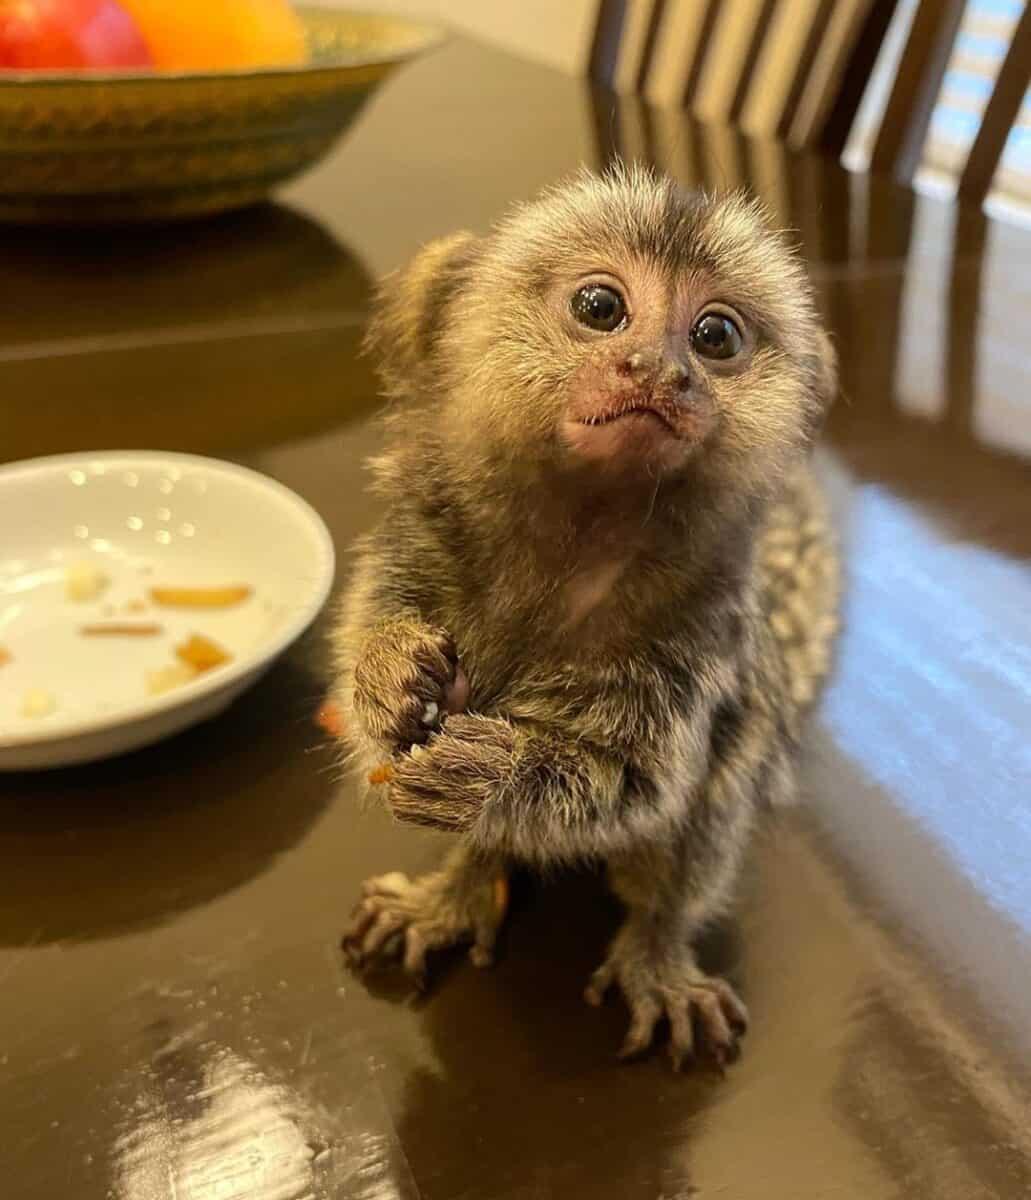 Finger monkey on the table